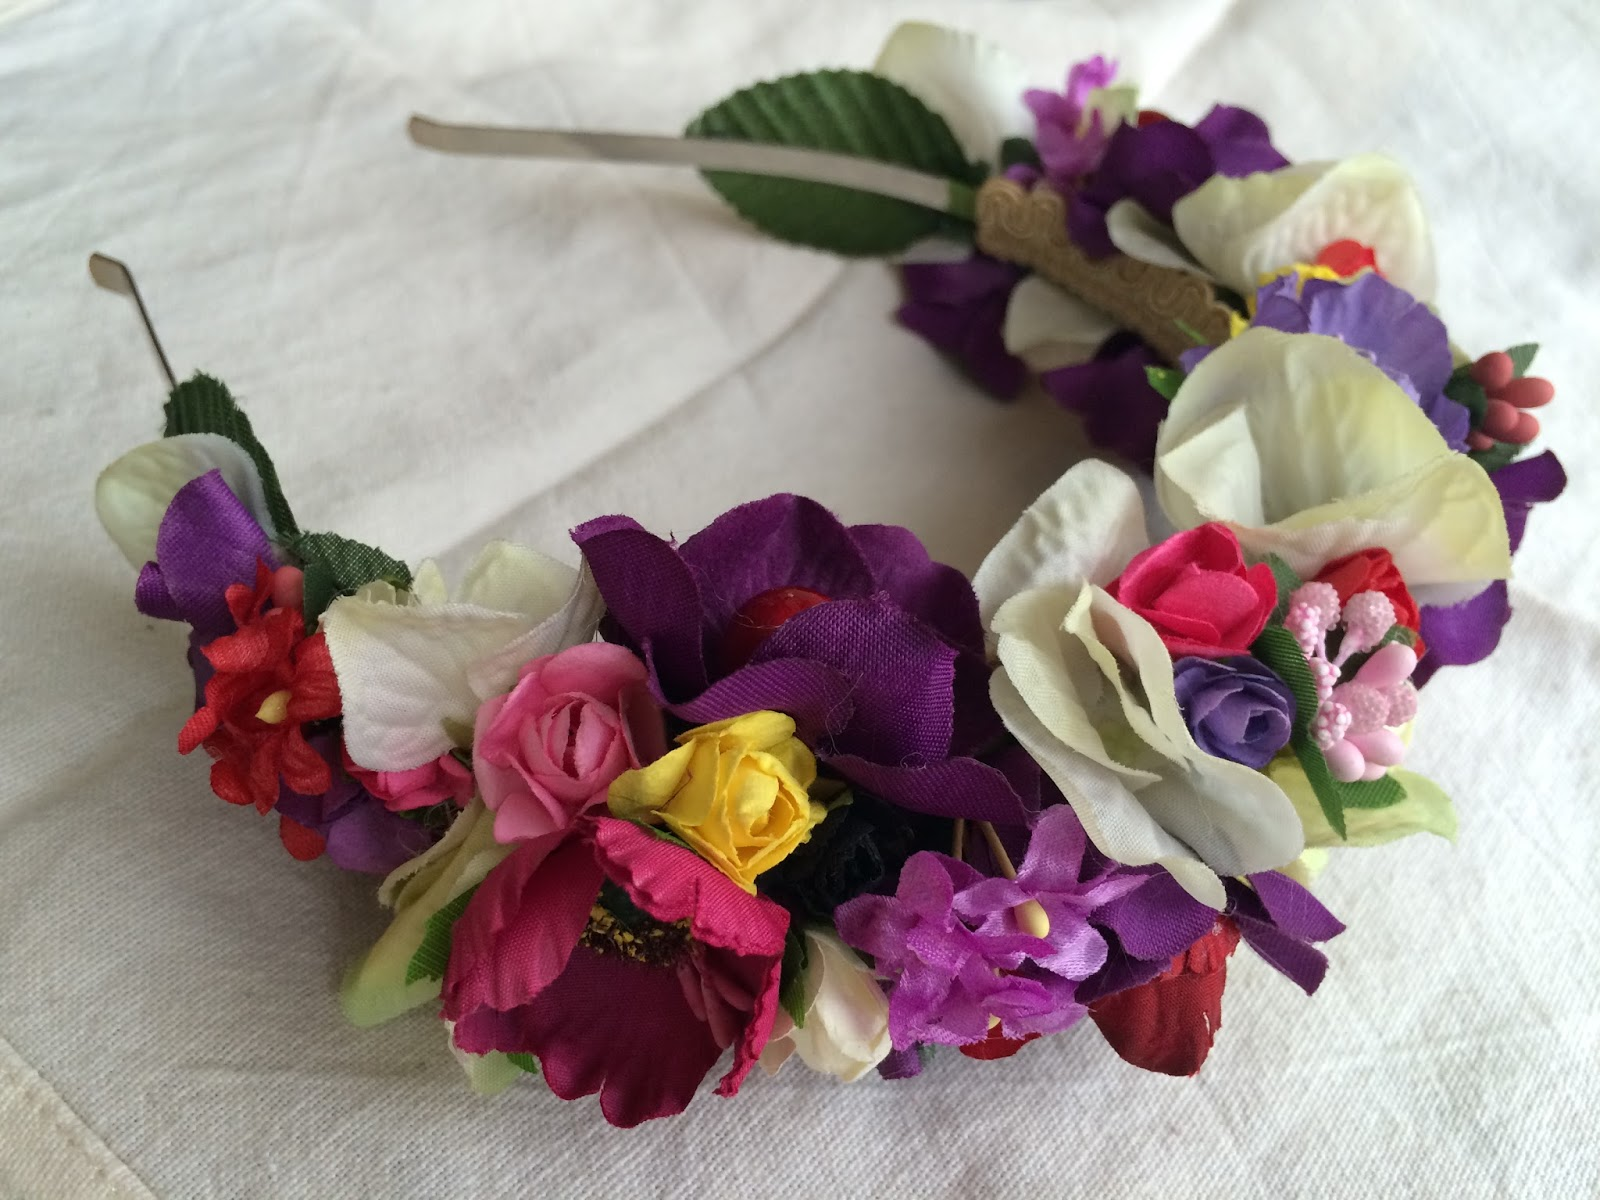 pvp diadema de flores rosa 45 envo certificado incluido - Como Hacer Diademas De Flores